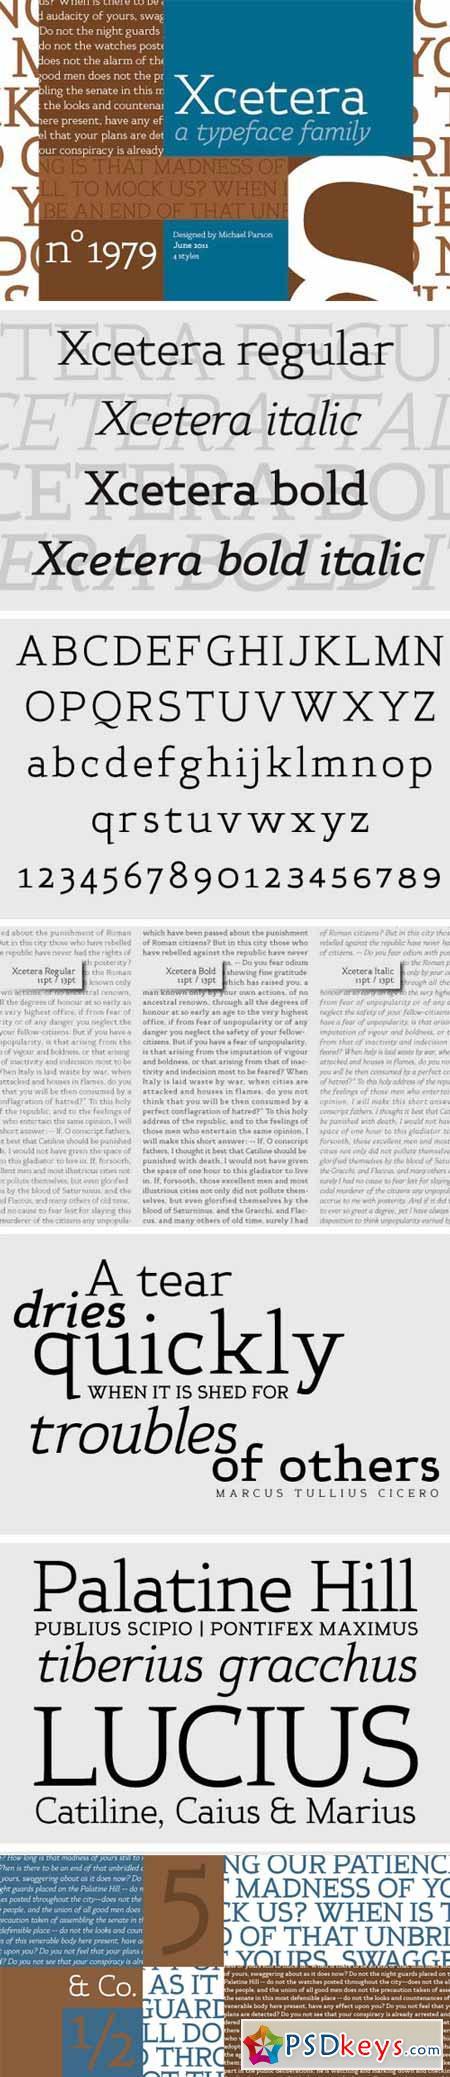 Xcetera Font Family